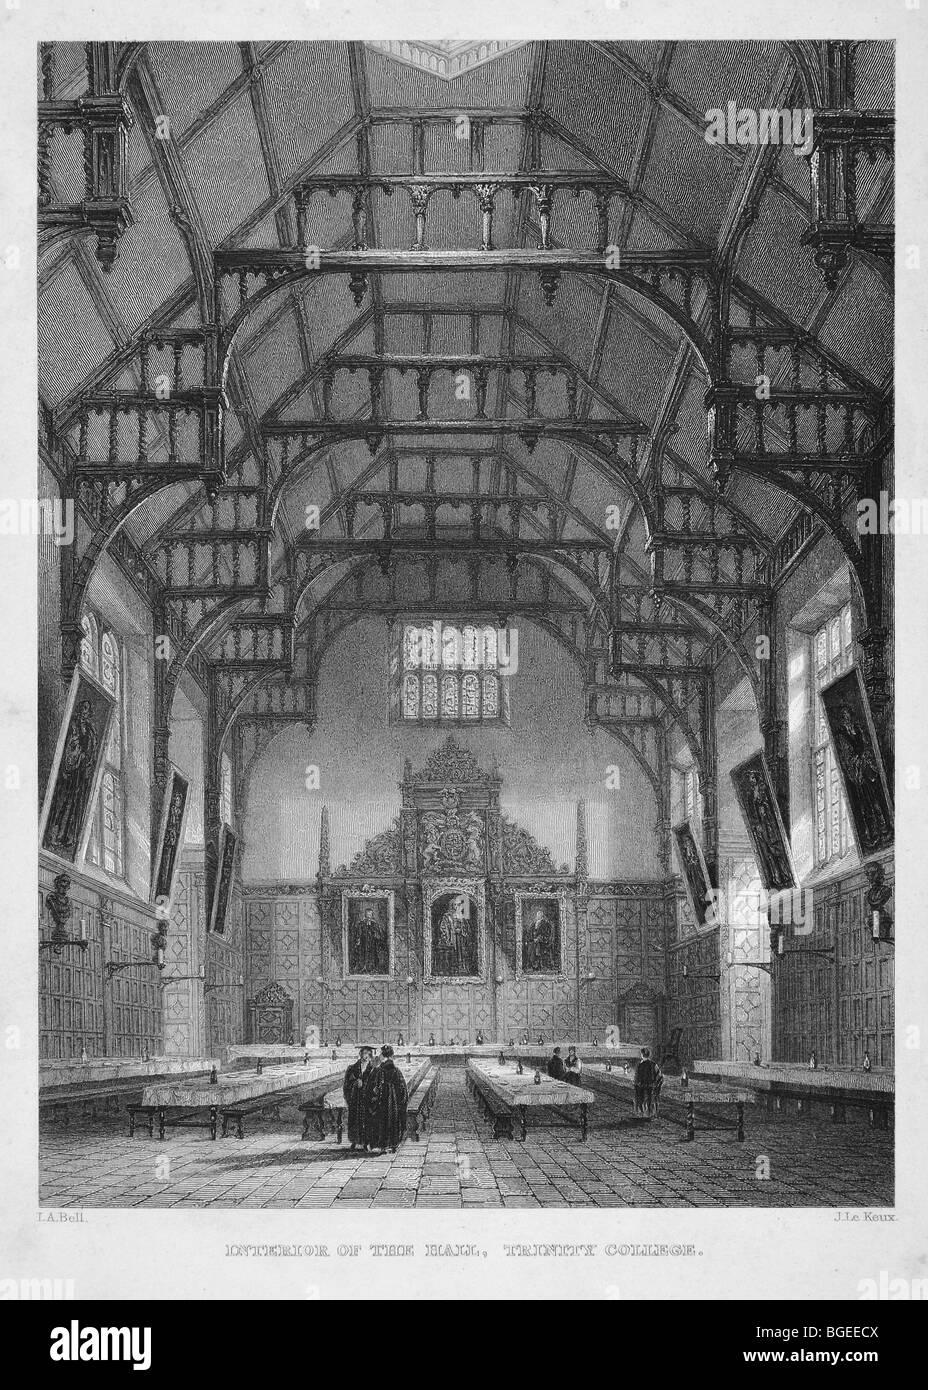 Trinity College, interior of the Hall - Stock Image